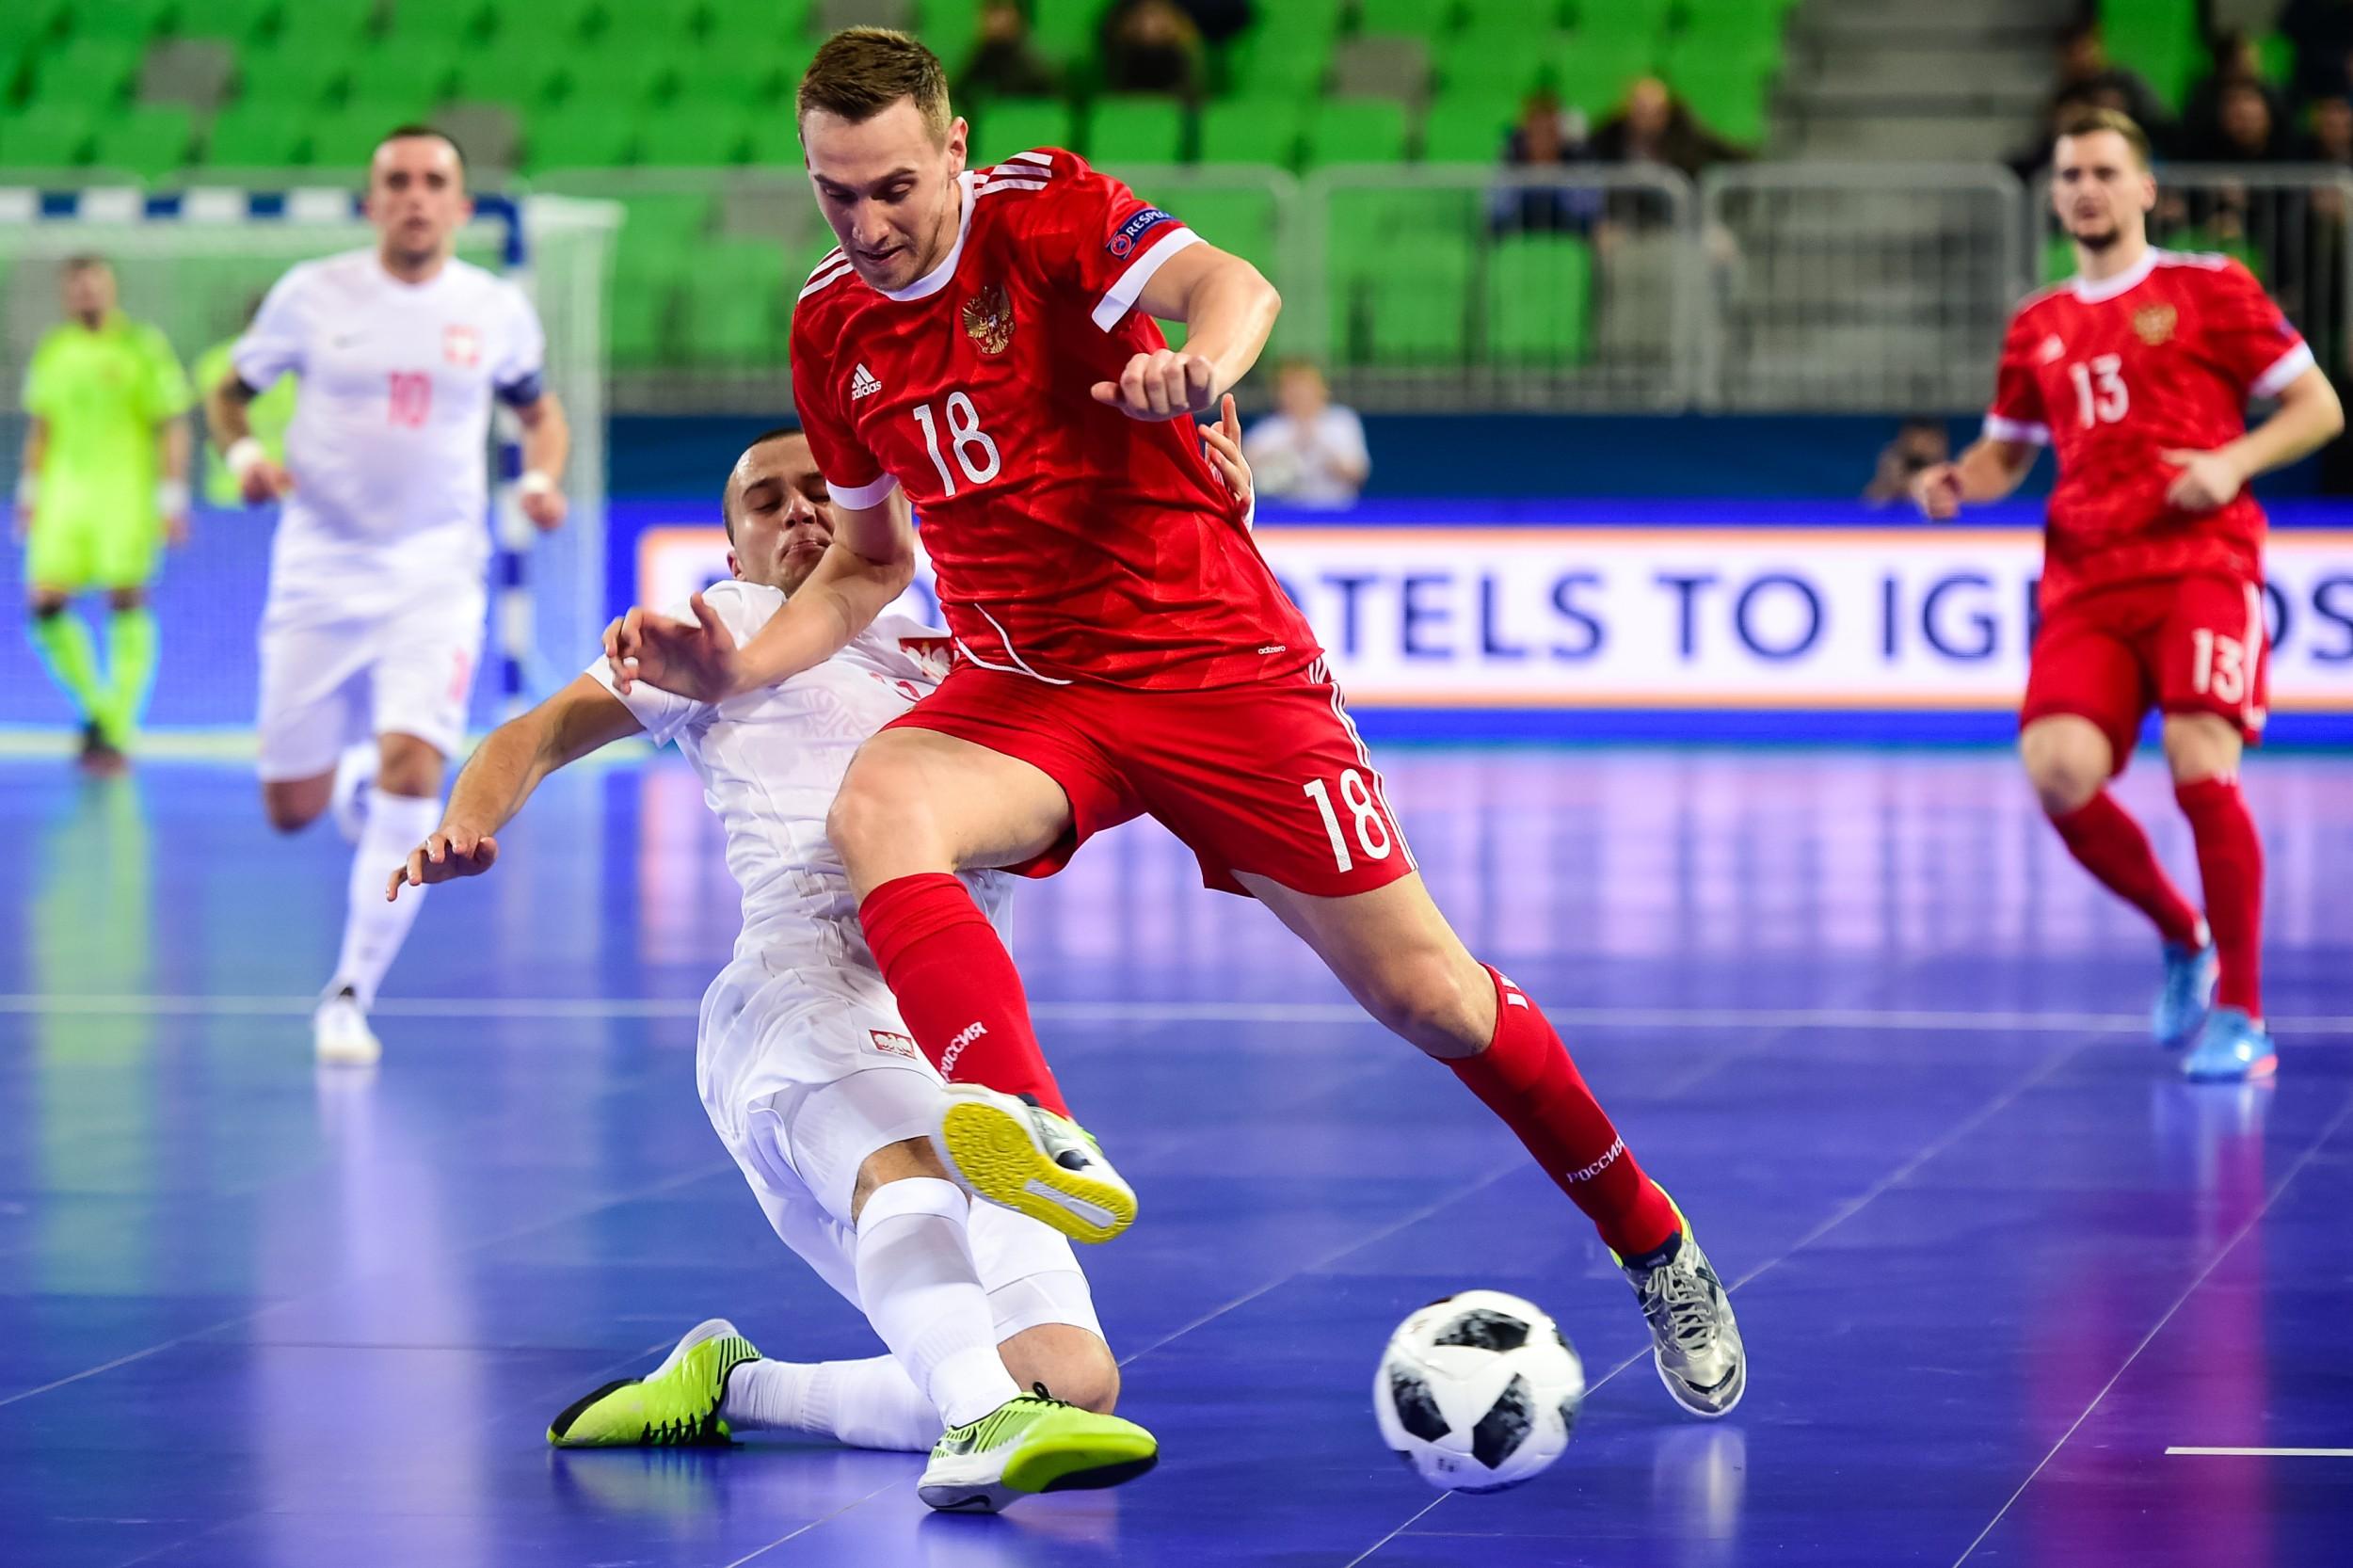 Futsal. Foto  Jure Makovec   Shutterstock.com b2996717d6927